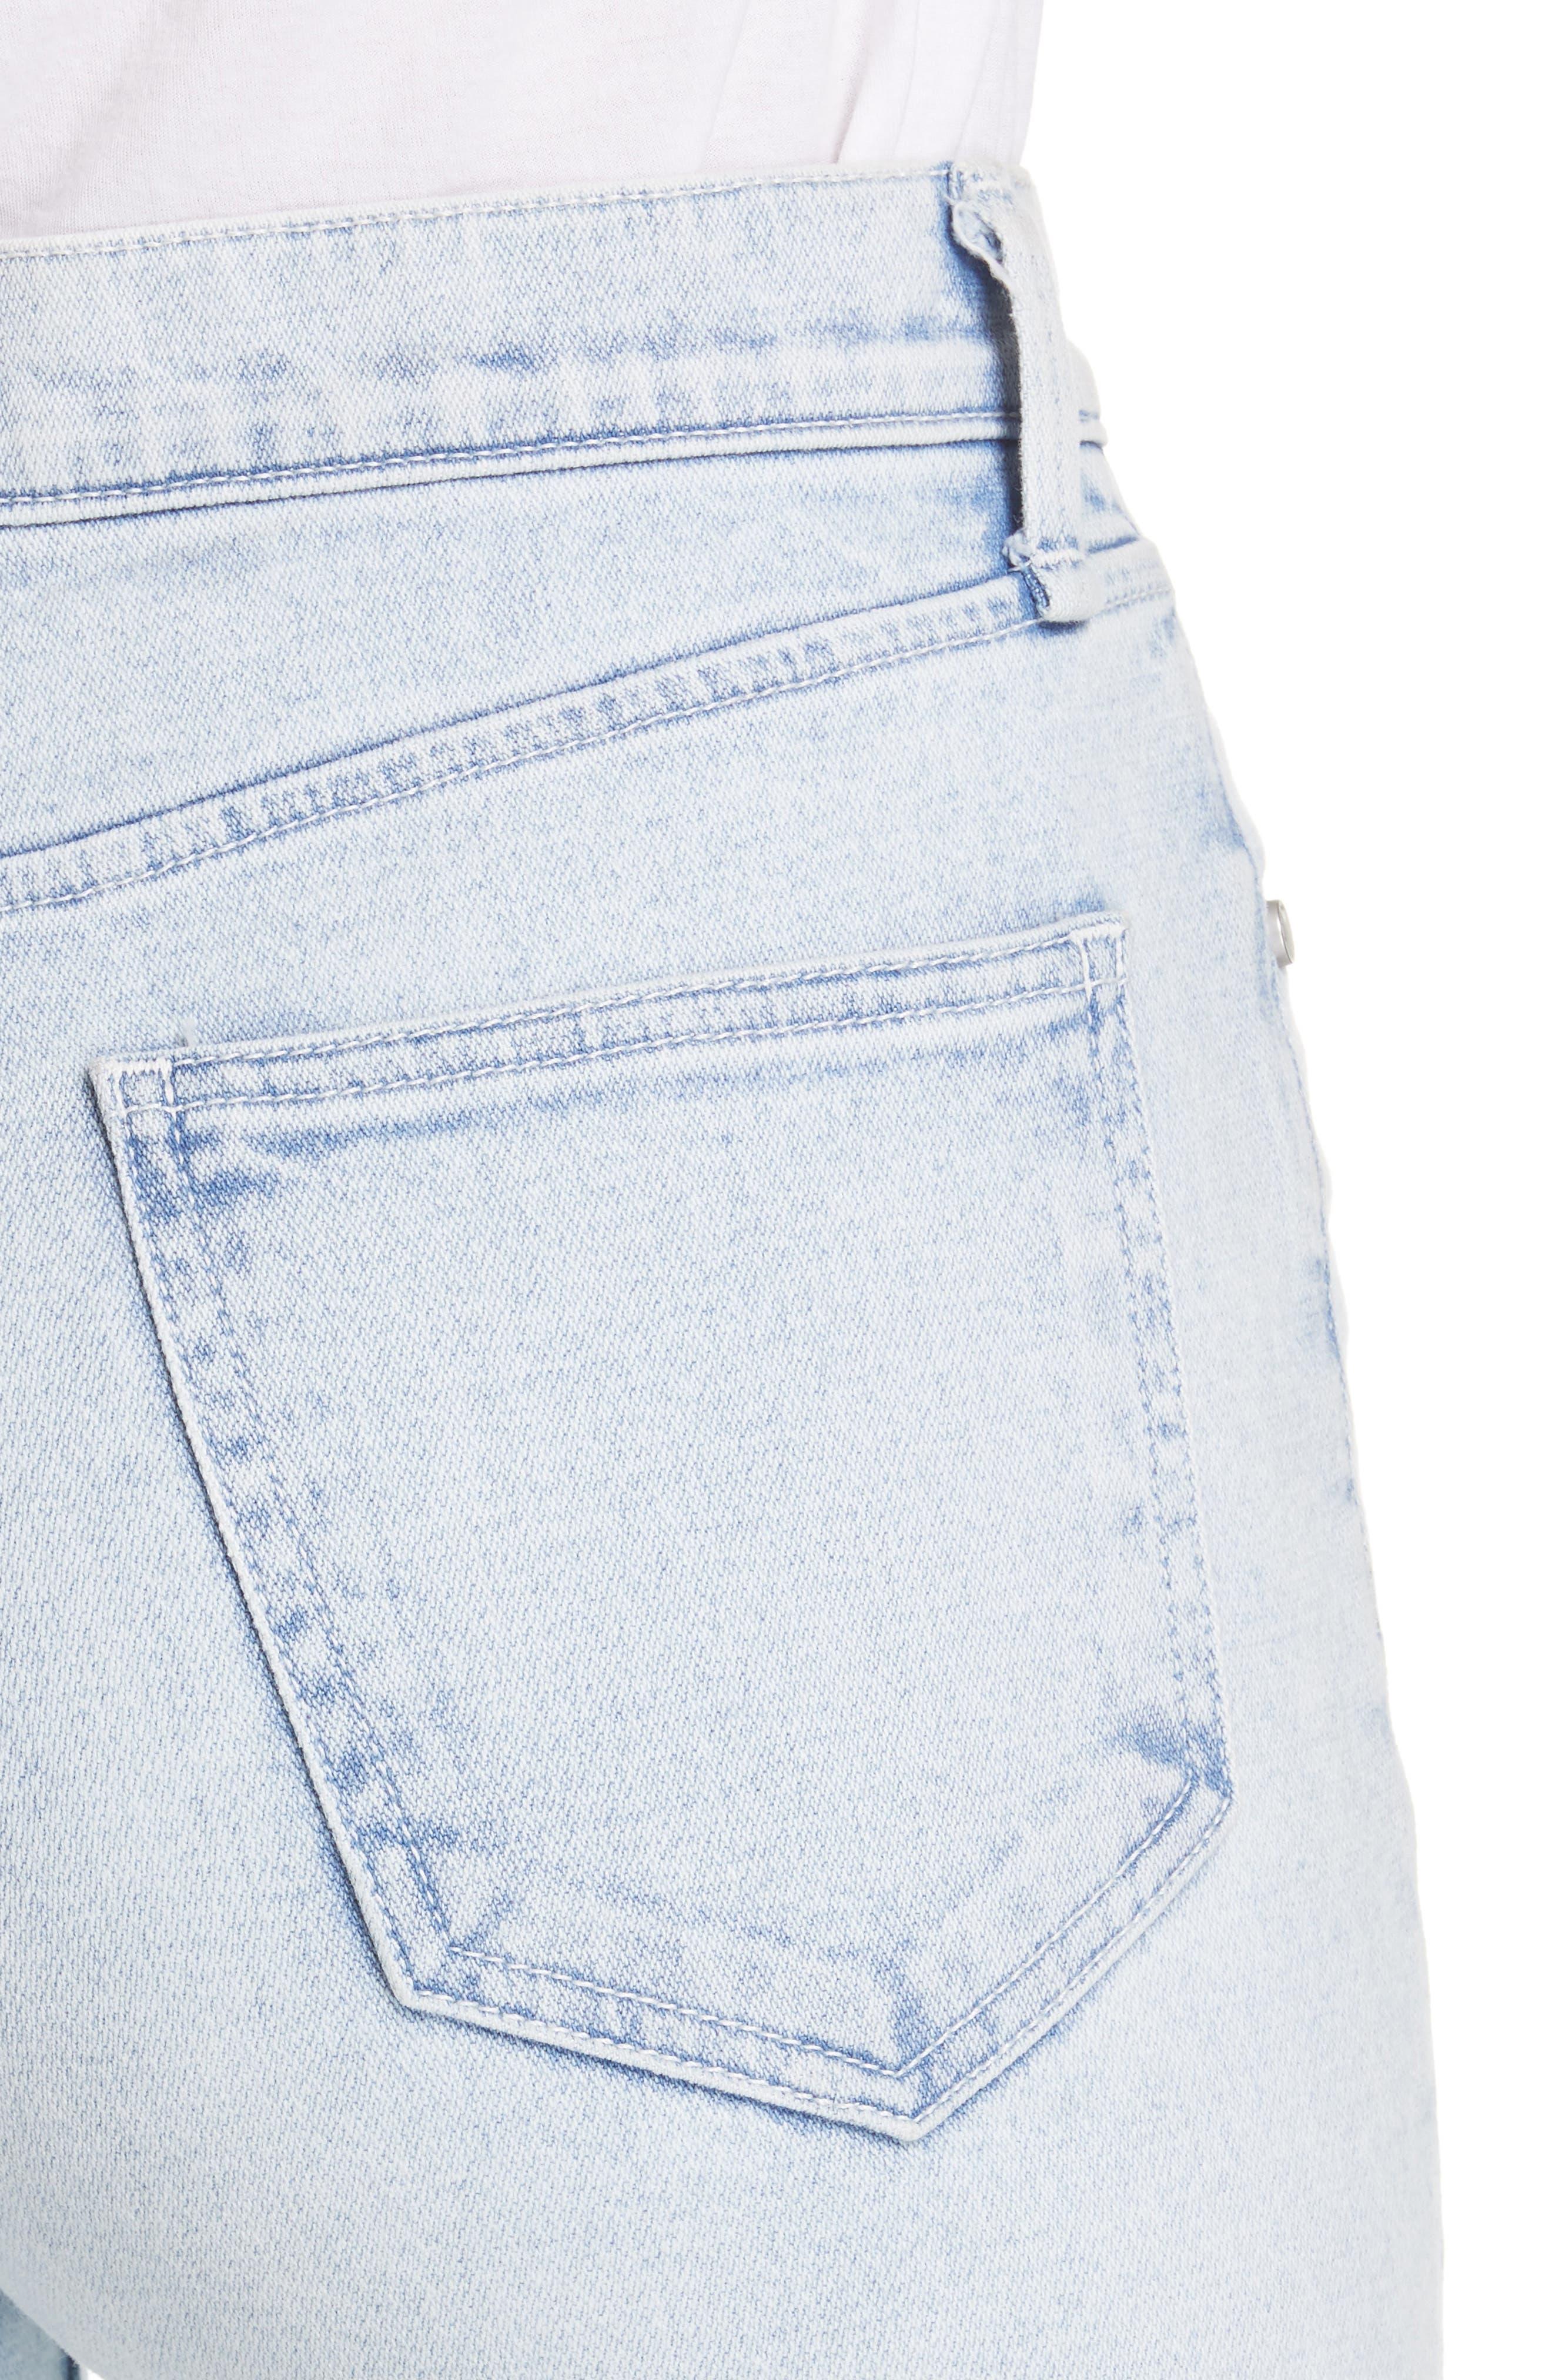 RAG & BONE, JEAN High Waist Ripped Ankle Cigarette Jeans, Alternate thumbnail 5, color, 450